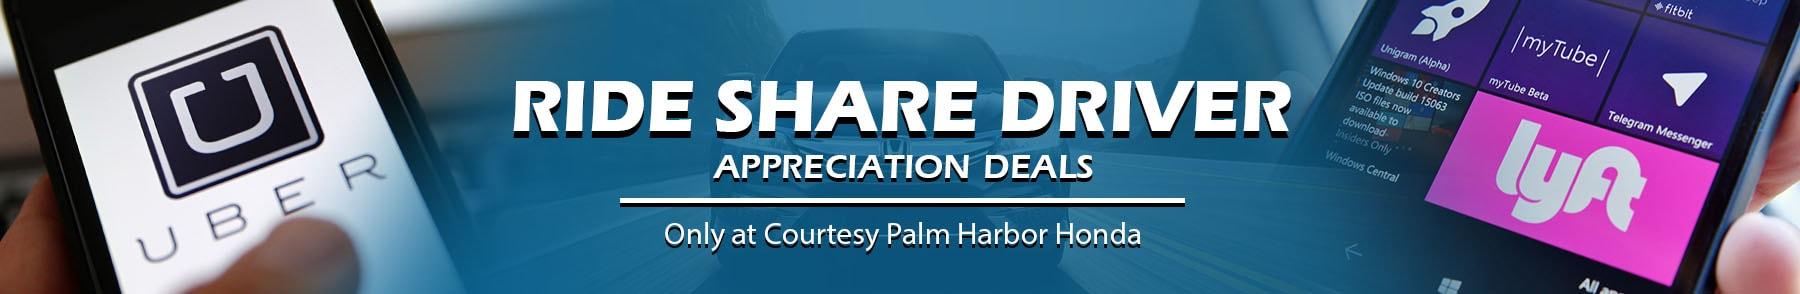 Honda Ride Share Driver Deals in Tampa FL | Special Honda Pricing